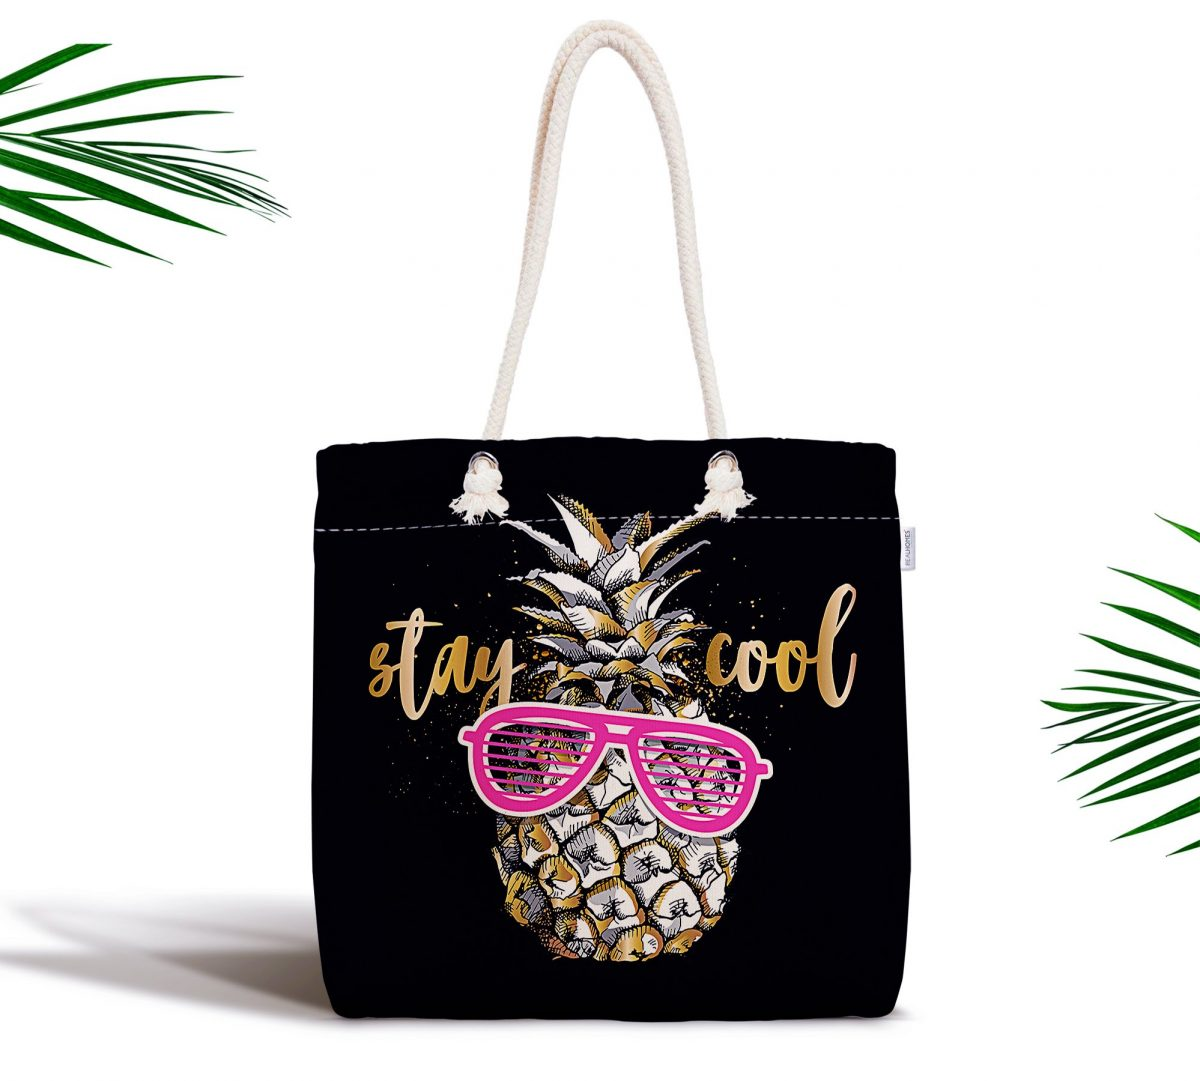 Siyah Zeminde Cool Ananas Desenli Modern Fermuarlı Kumaş Çanta Realhomes